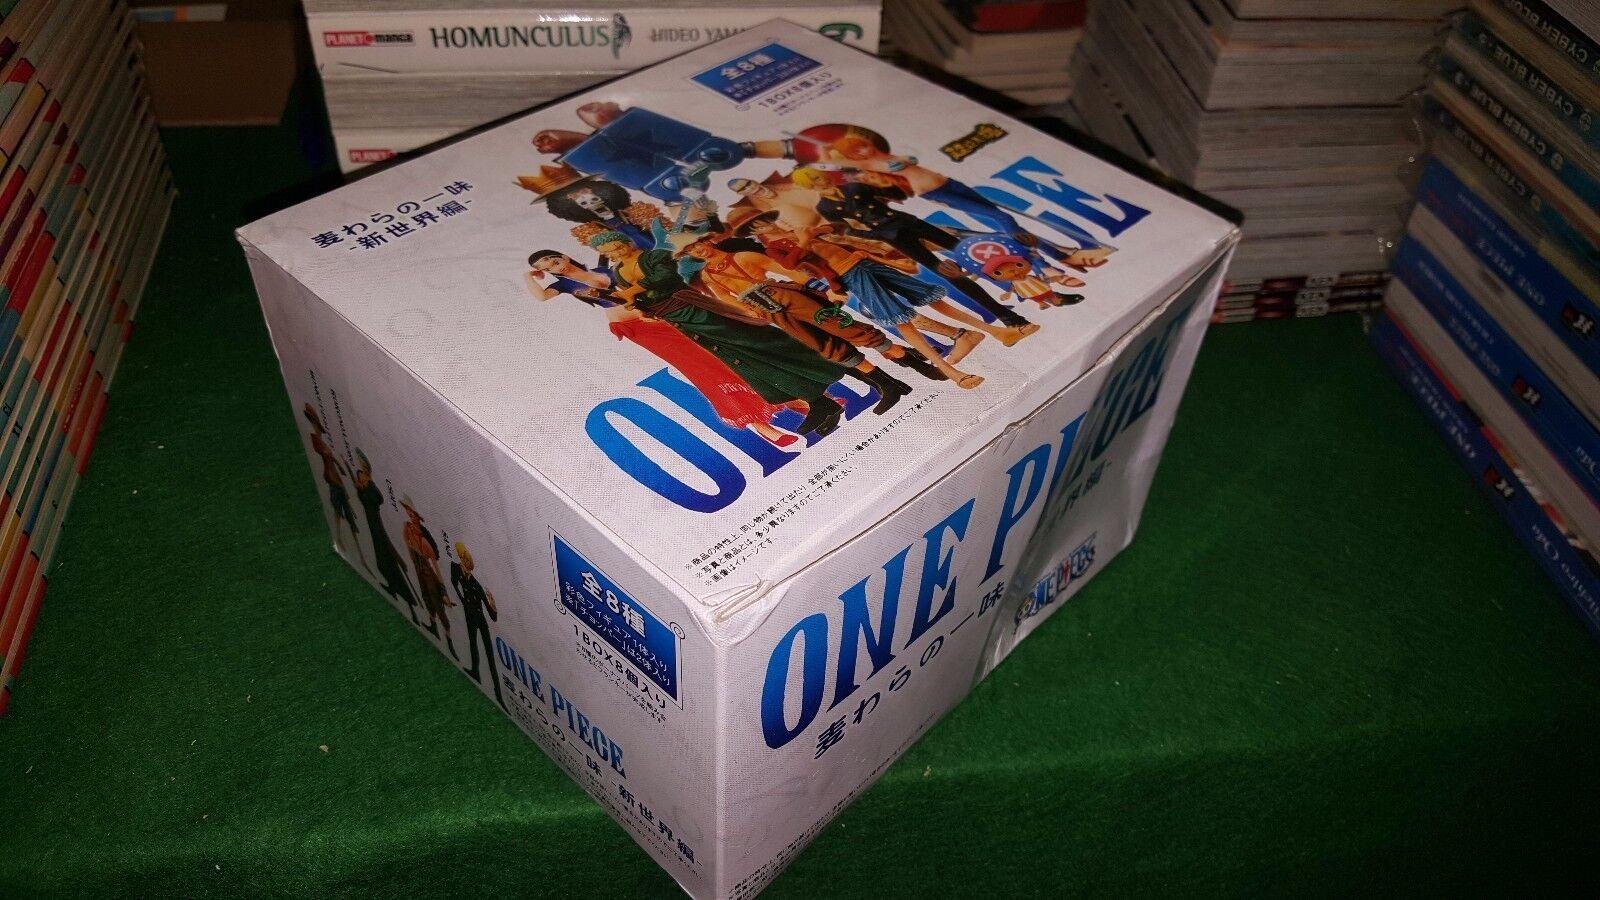 ONE PIECE ACTION FIGURA 1BOX8 SUPER MODELING 8 PEZZI